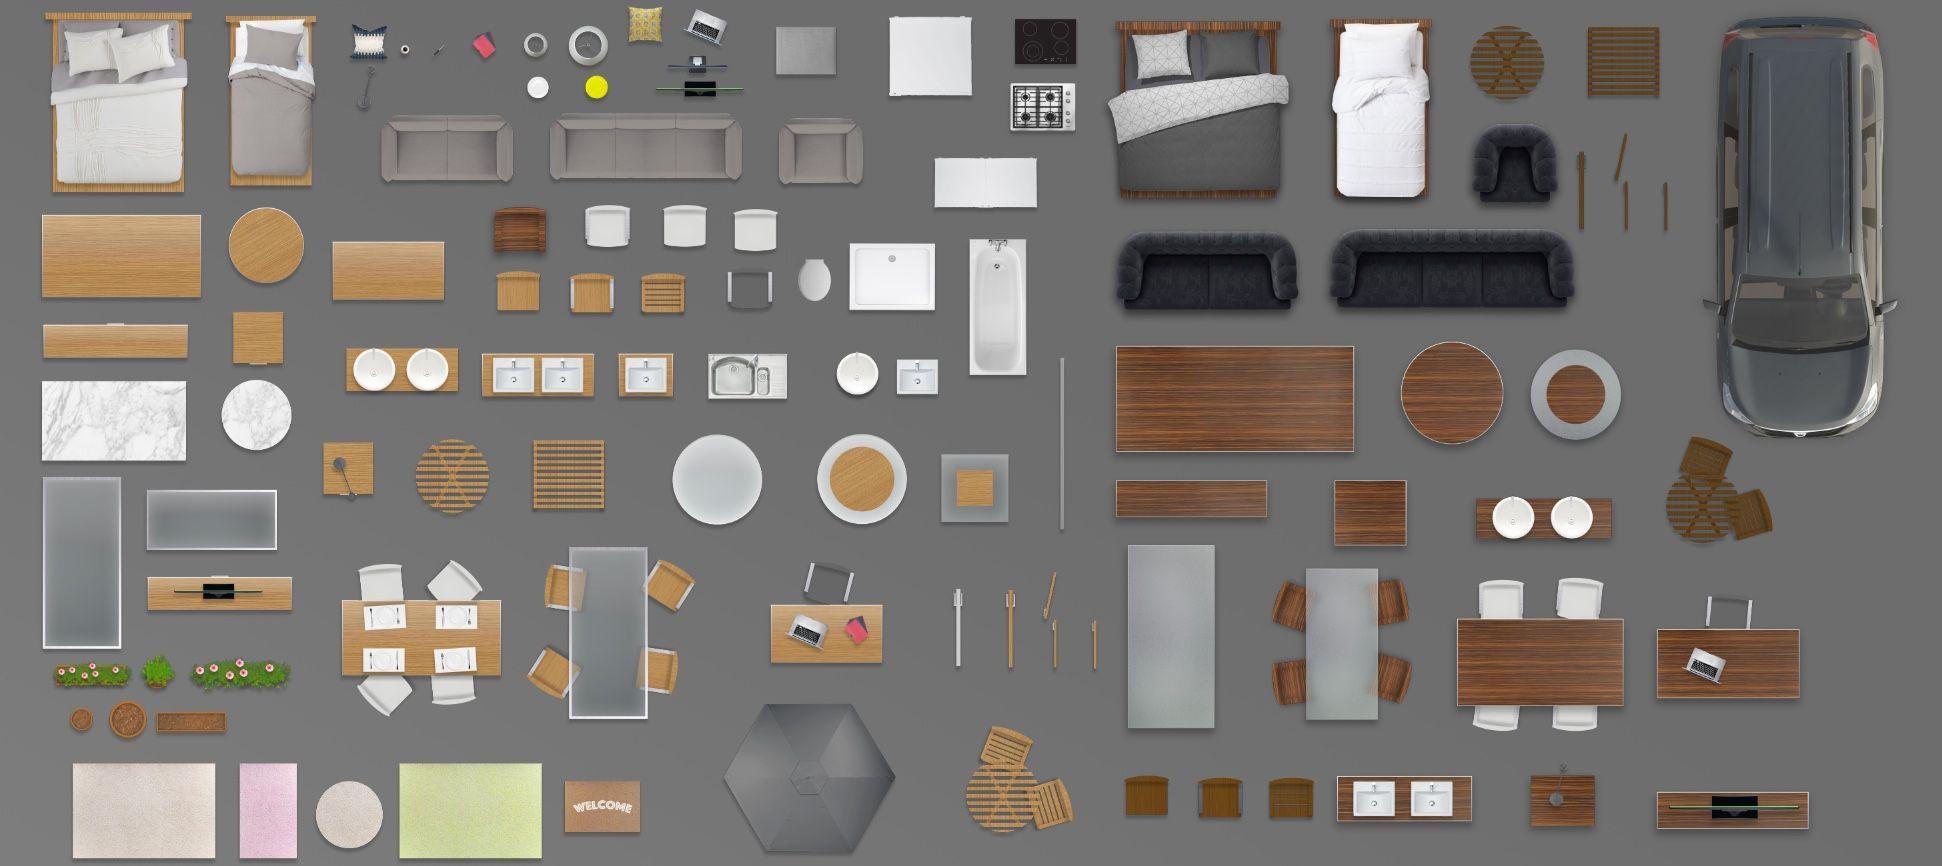 2d Furniture Floorplan Top View Psd 3d Model Render Wood 3d Model Drawing Furniture Modern Furniture Sets Interior Design Layout